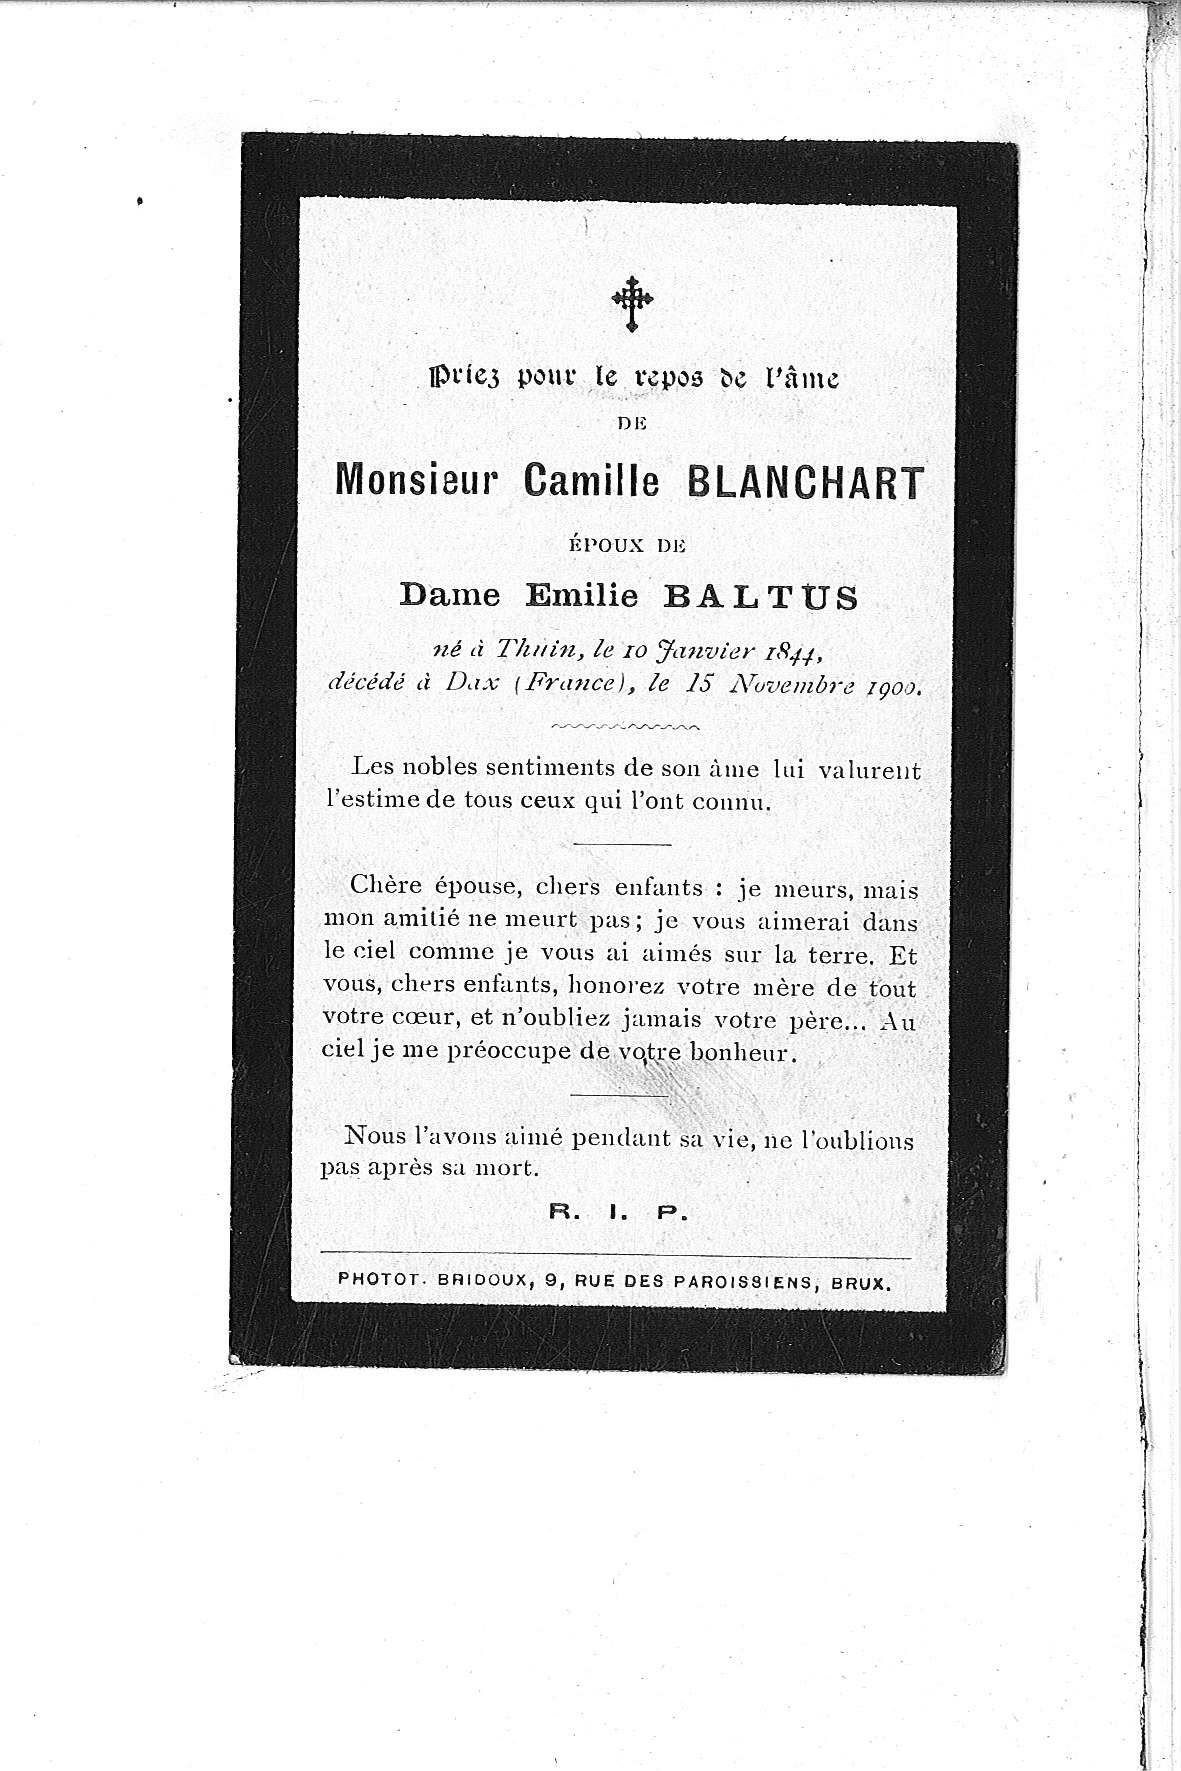 Camille(1900)20110303133103_00038.jpg